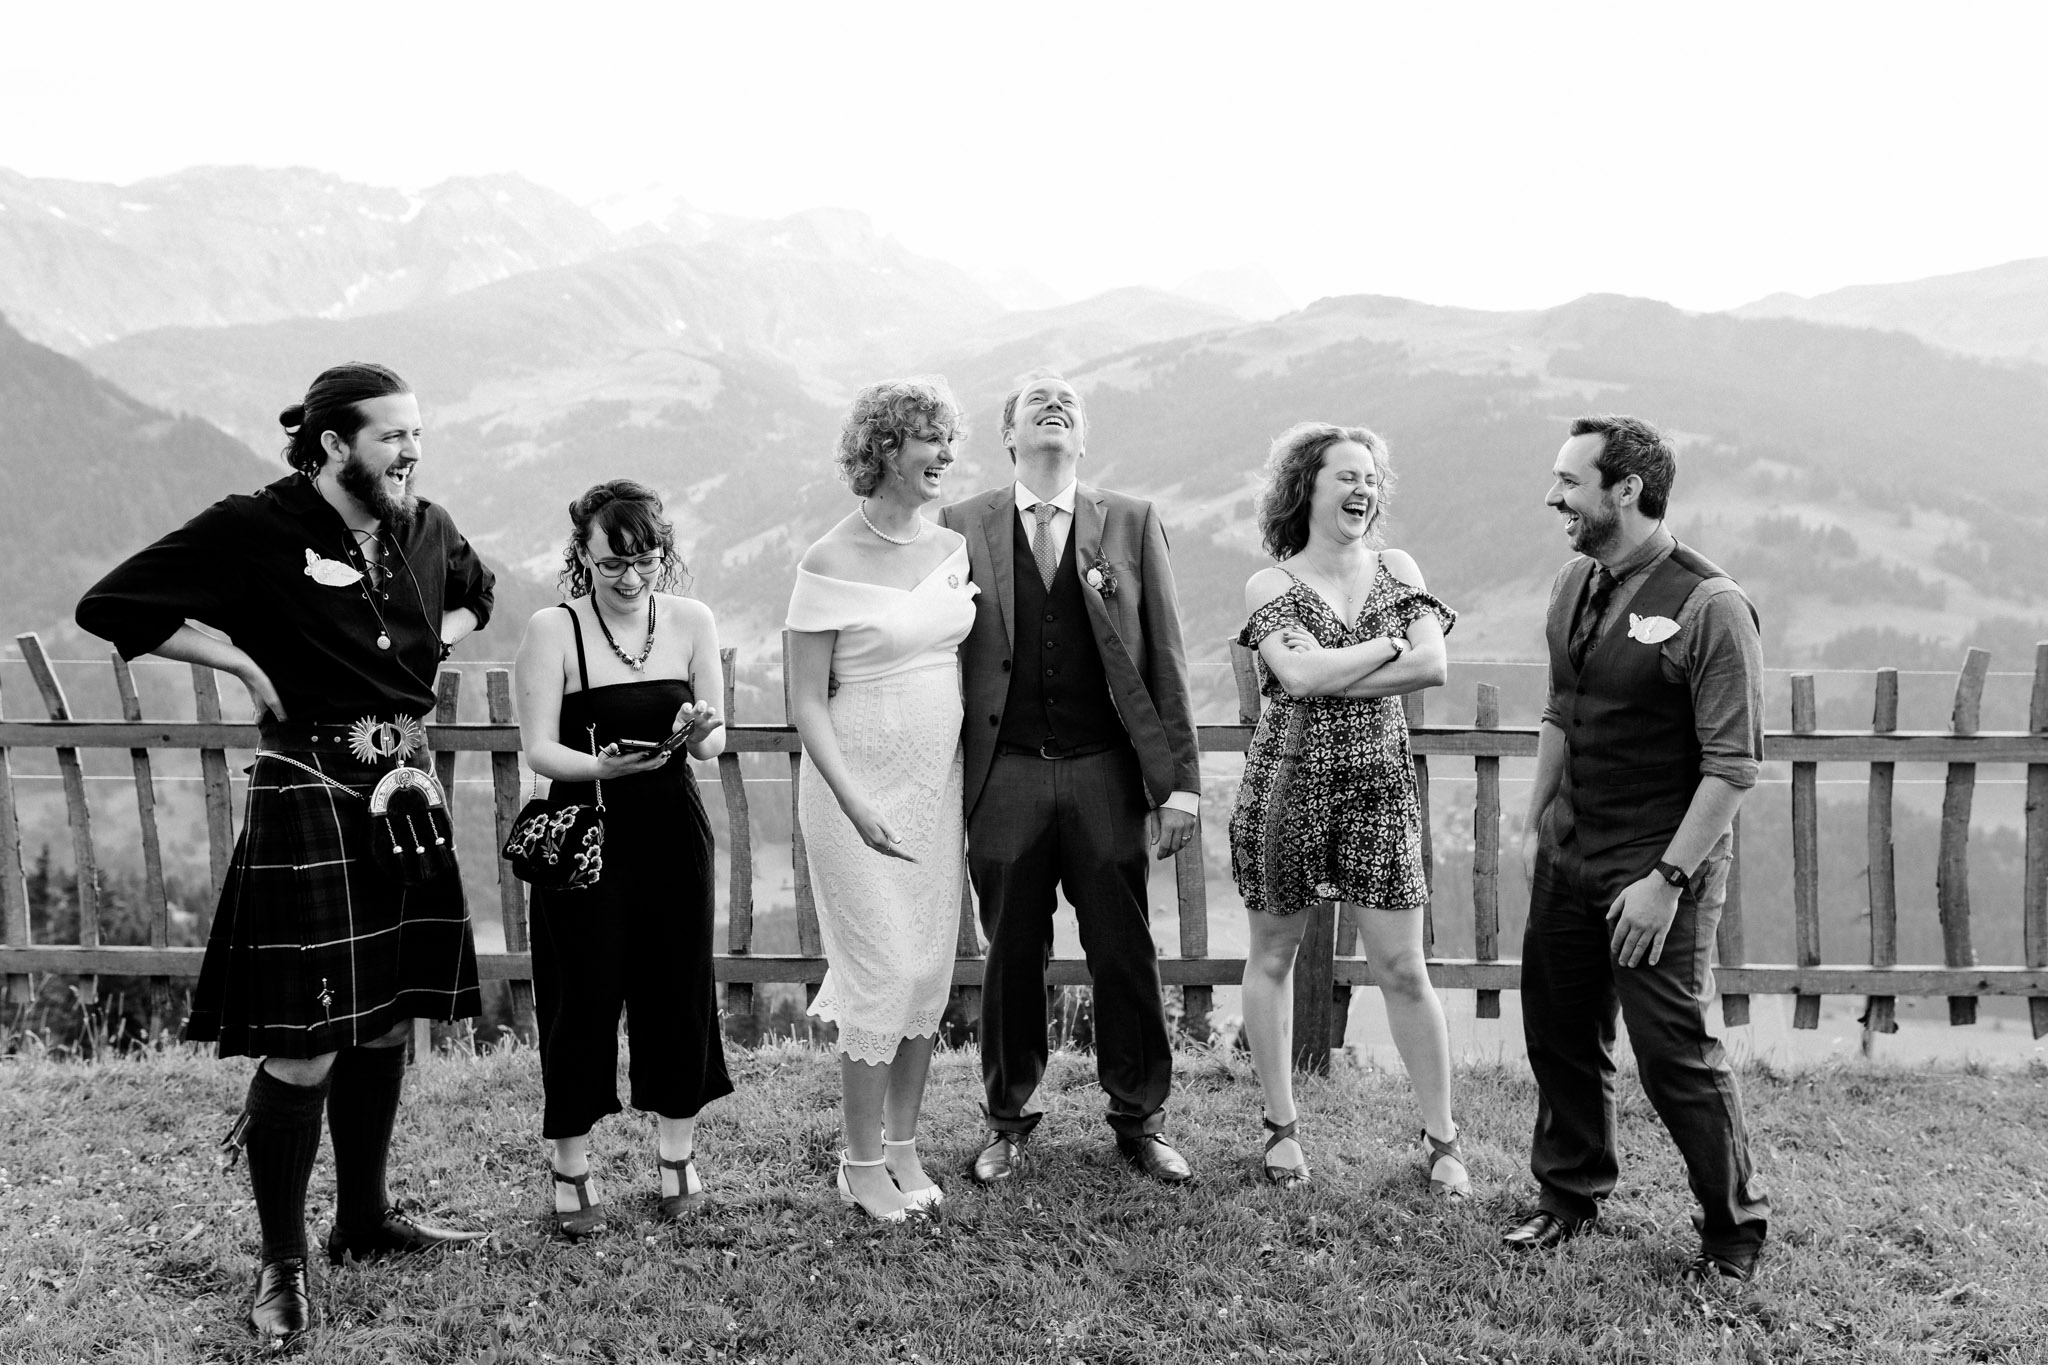 Lenl-Simmental-Buehlerhof-Pia-Anna-Christian-Wedding-Photography-EK-88.jpg